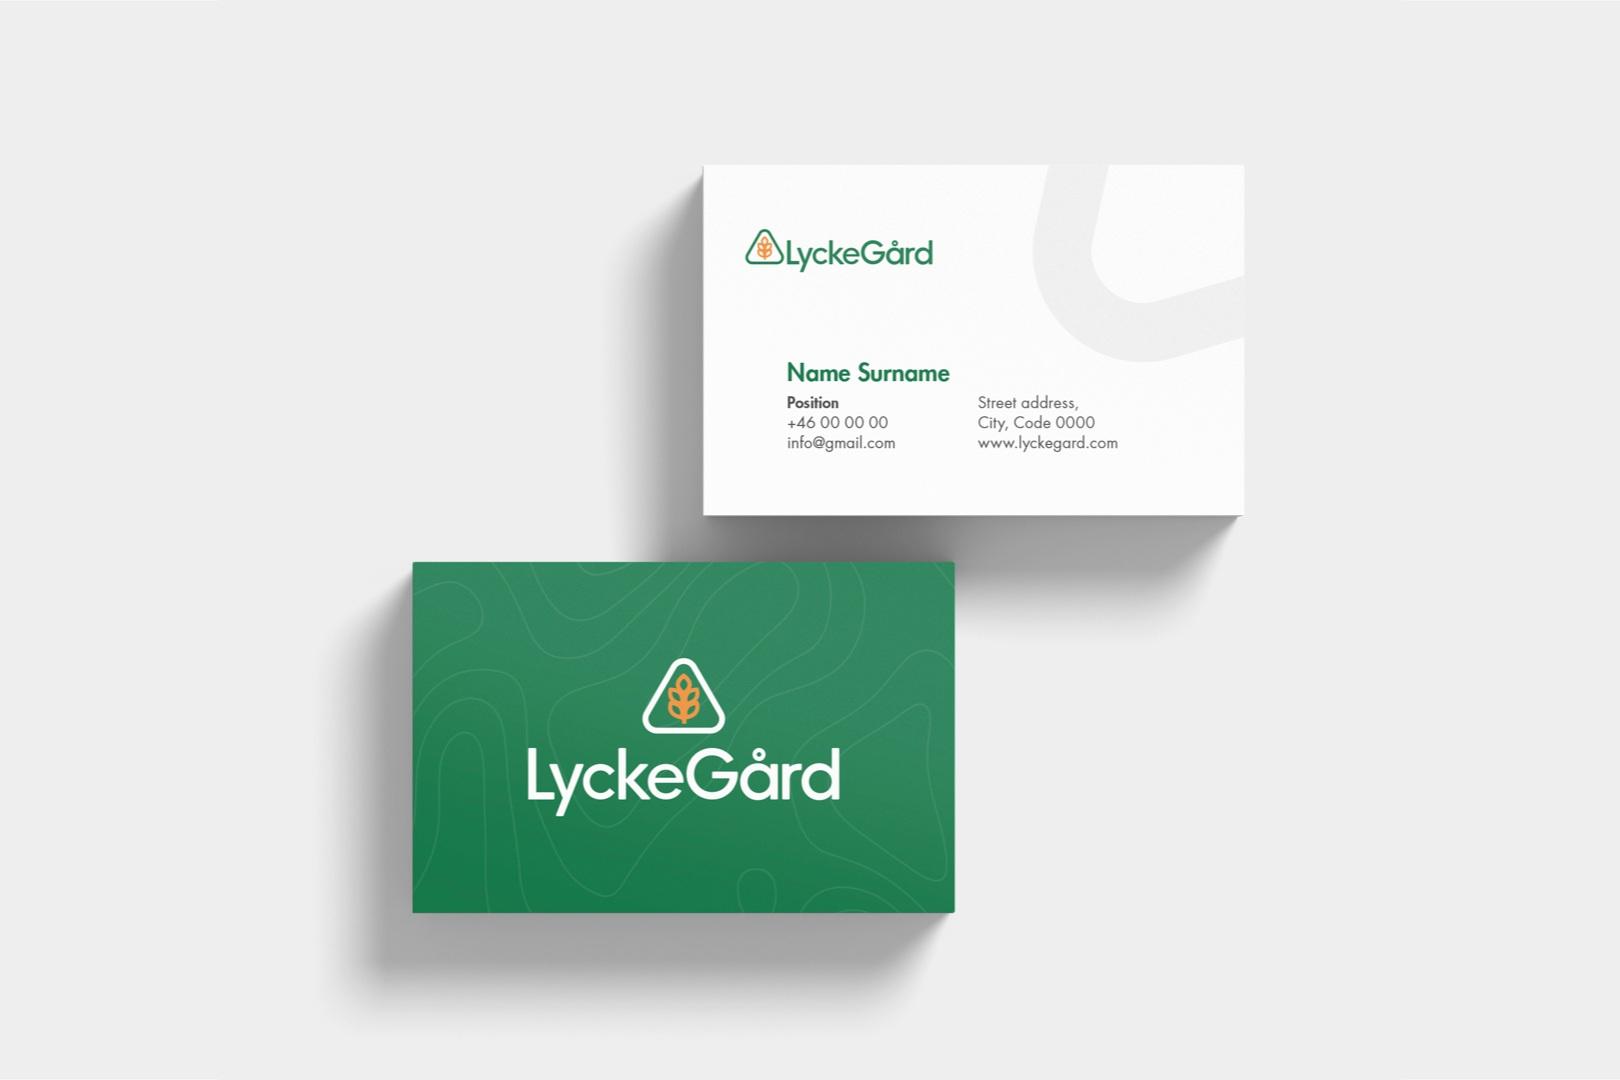 Logotype & visual identity -